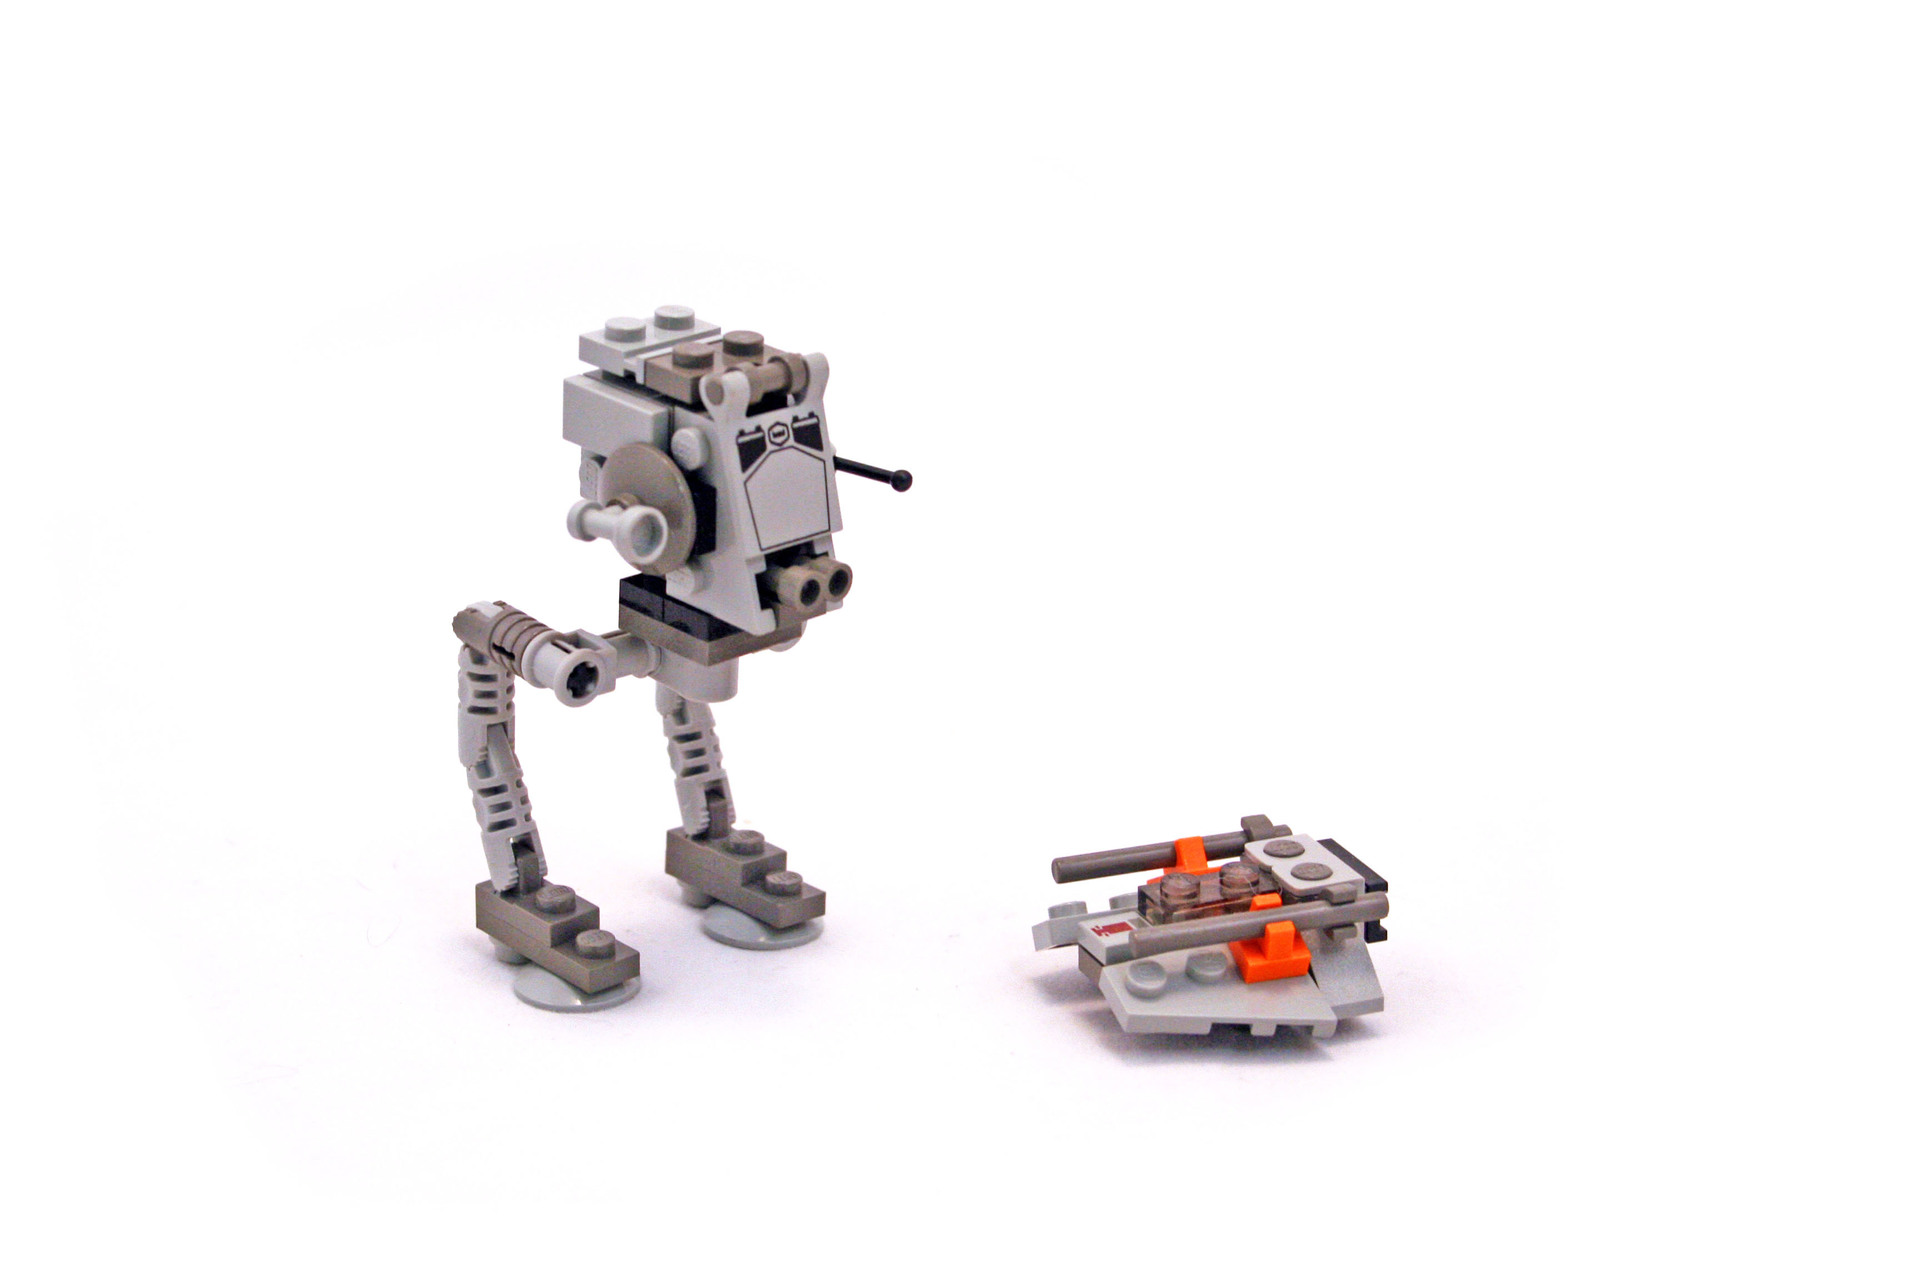 lego mini tie advanced instructions